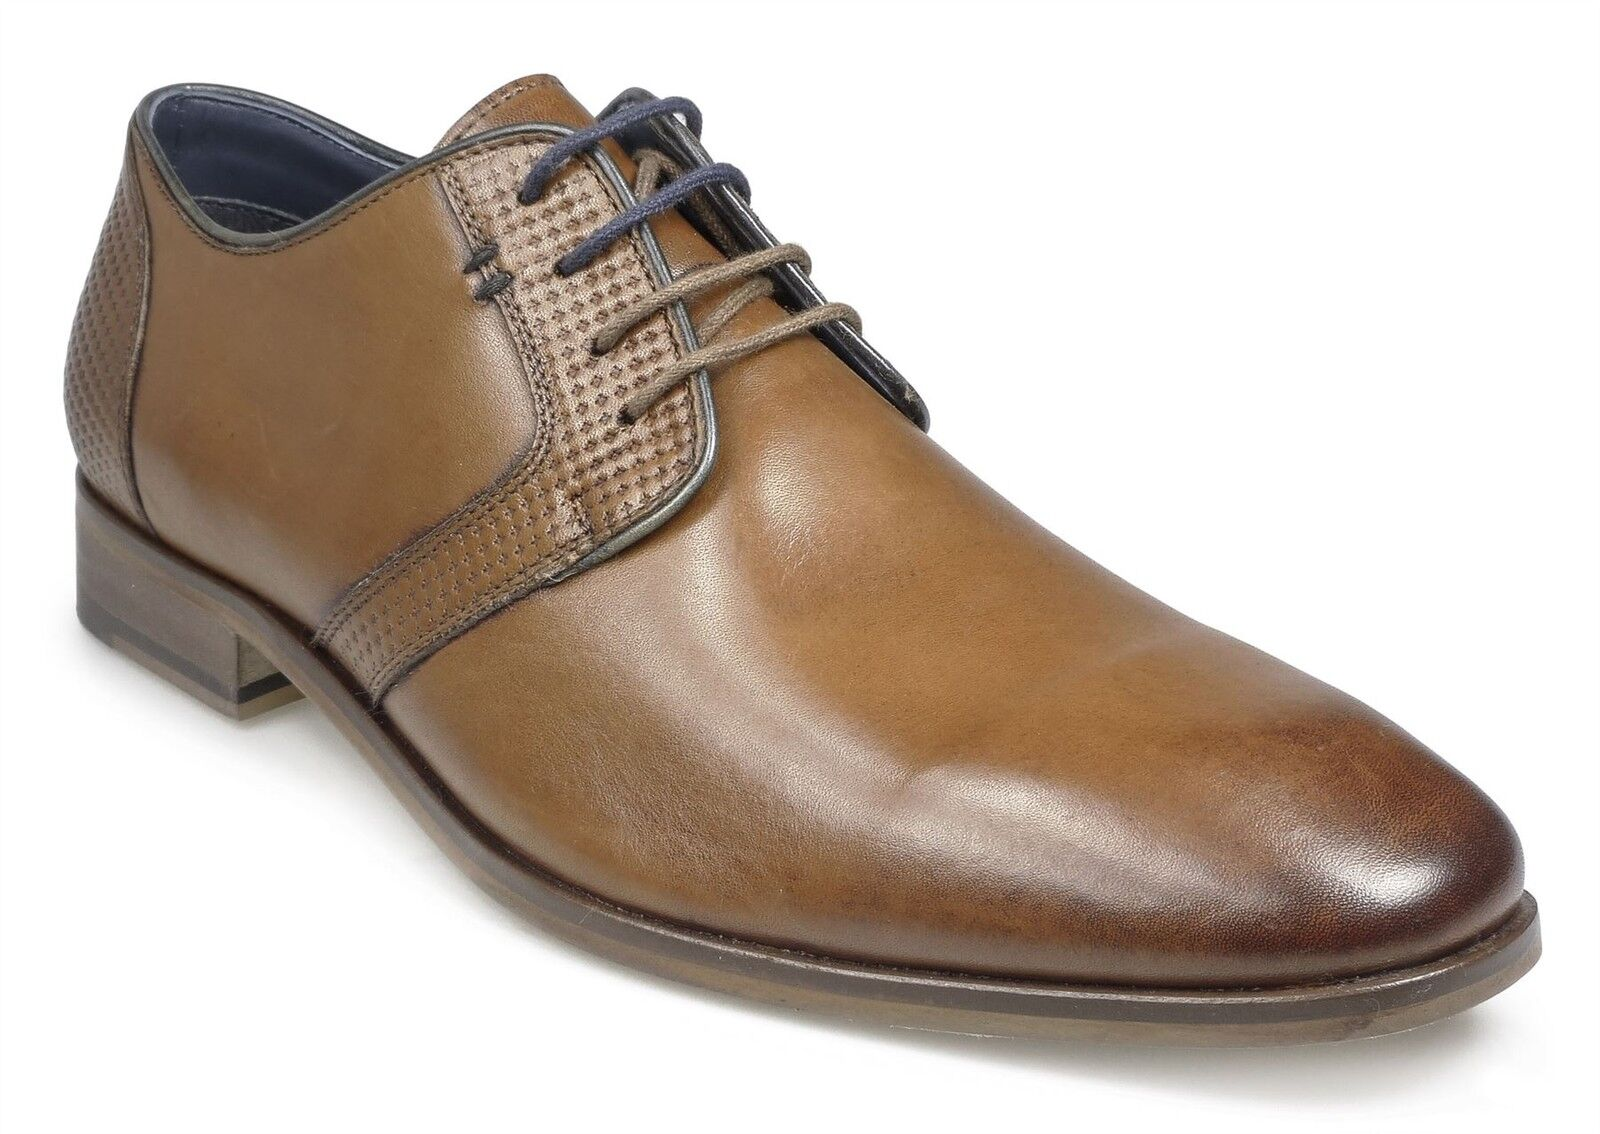 Paul O'Donnell Herren Geschnürte Formelle Schuhe Tampa in Cognac größen